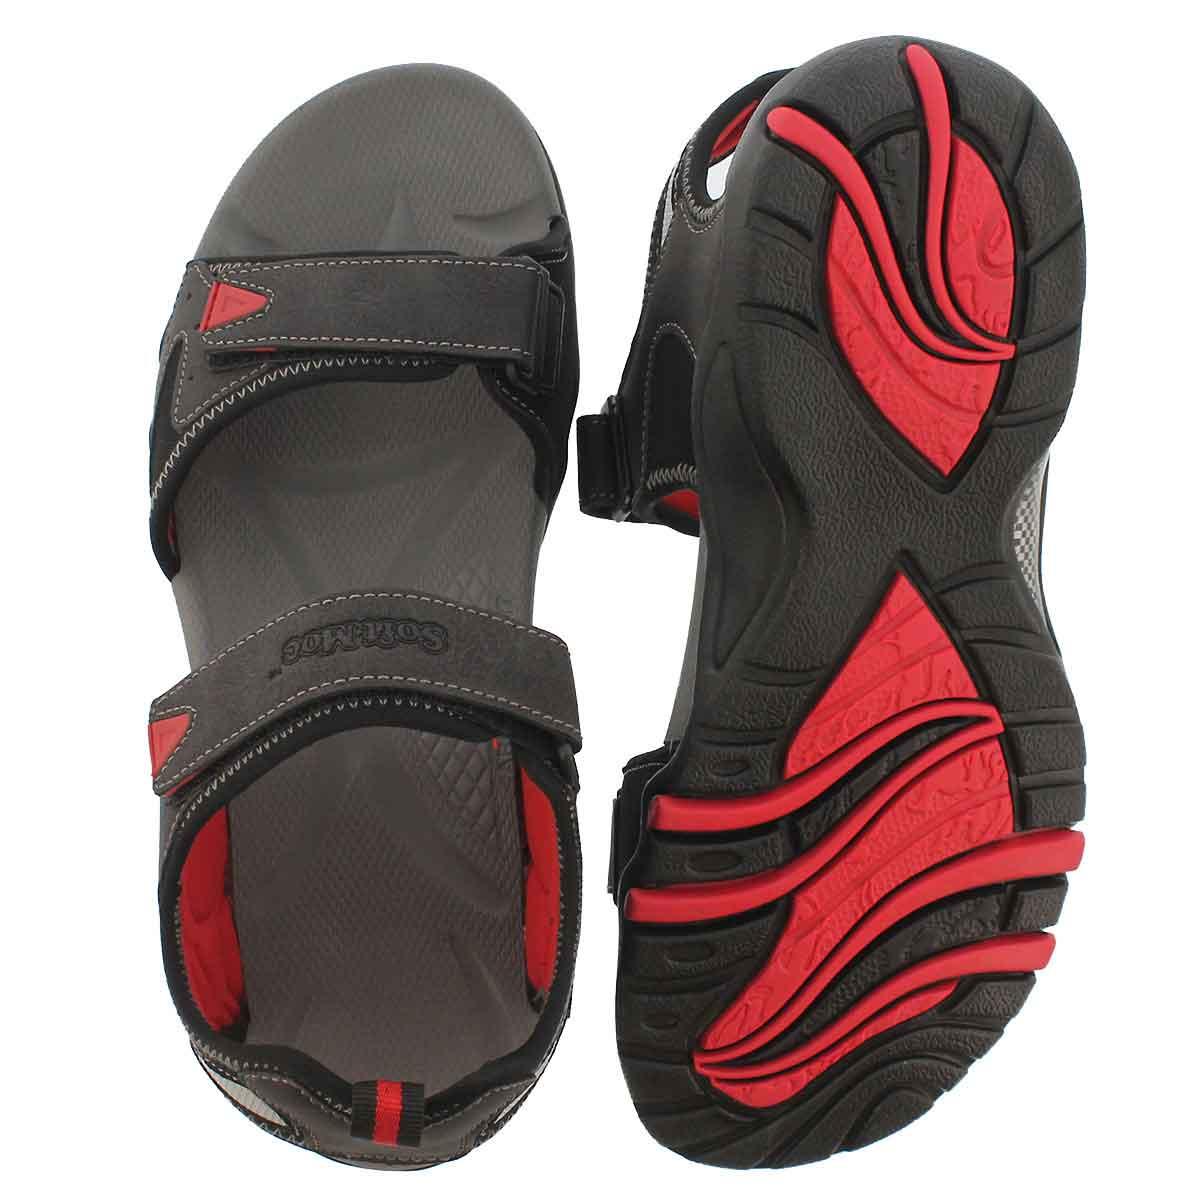 Mns Kedge black 3 strap sport sandal